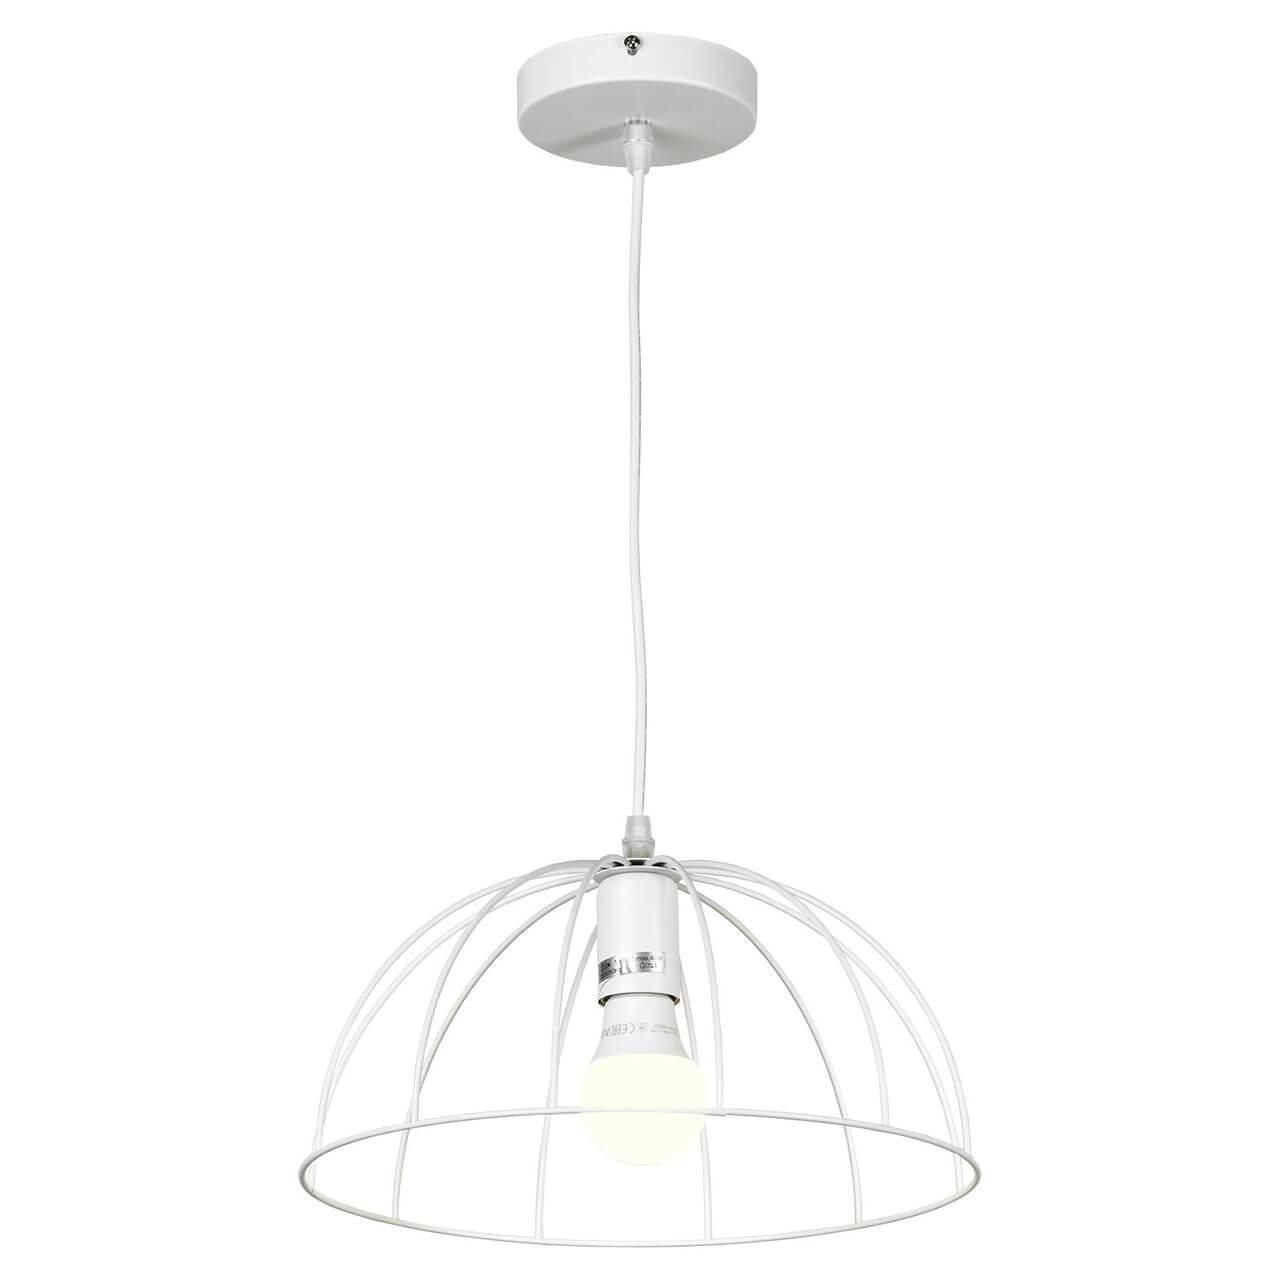 Светильник Lussole LSP-8214 Lattice